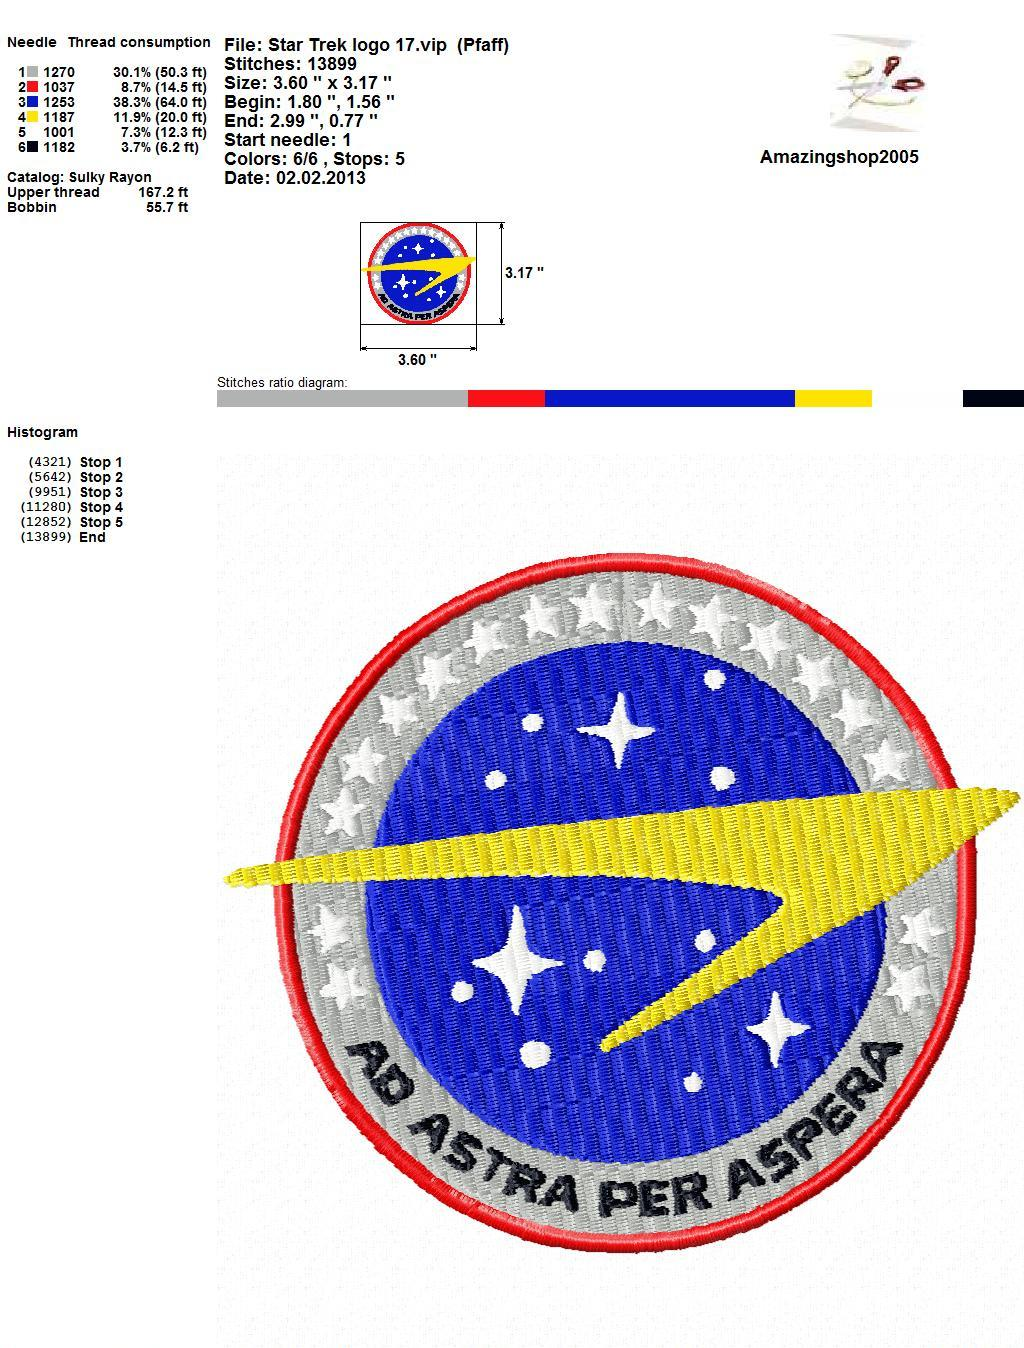 Star trek embroidery design crafting sewing other for Wohnung star trek design